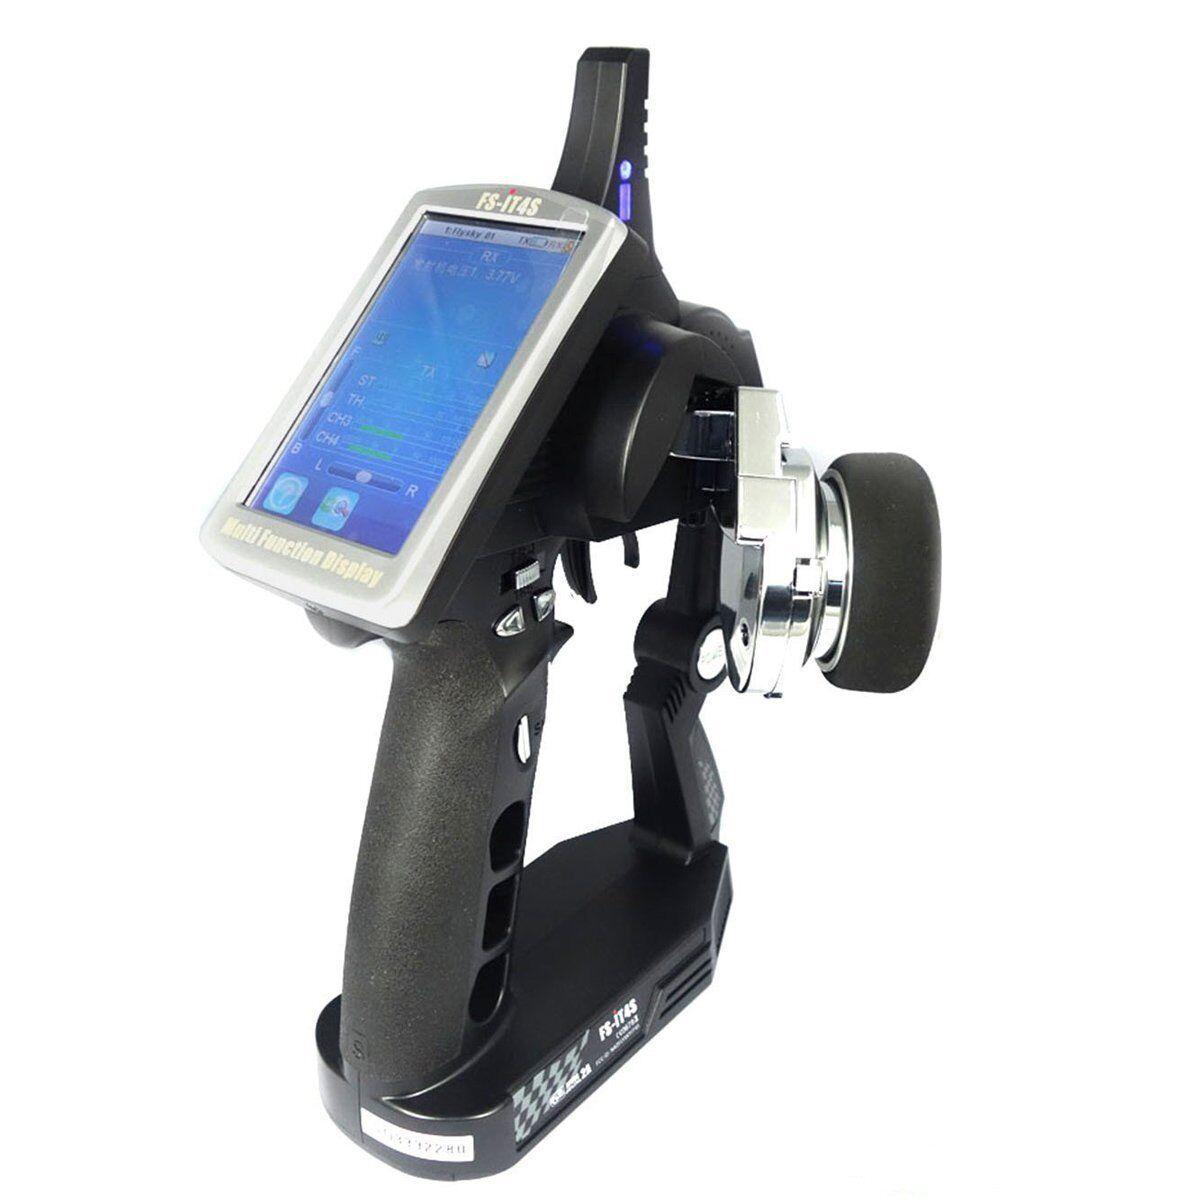 Flysky fs-it4s 2.4ghz 4ch afhds 2 Stiefel system sender radio mit touchscreen